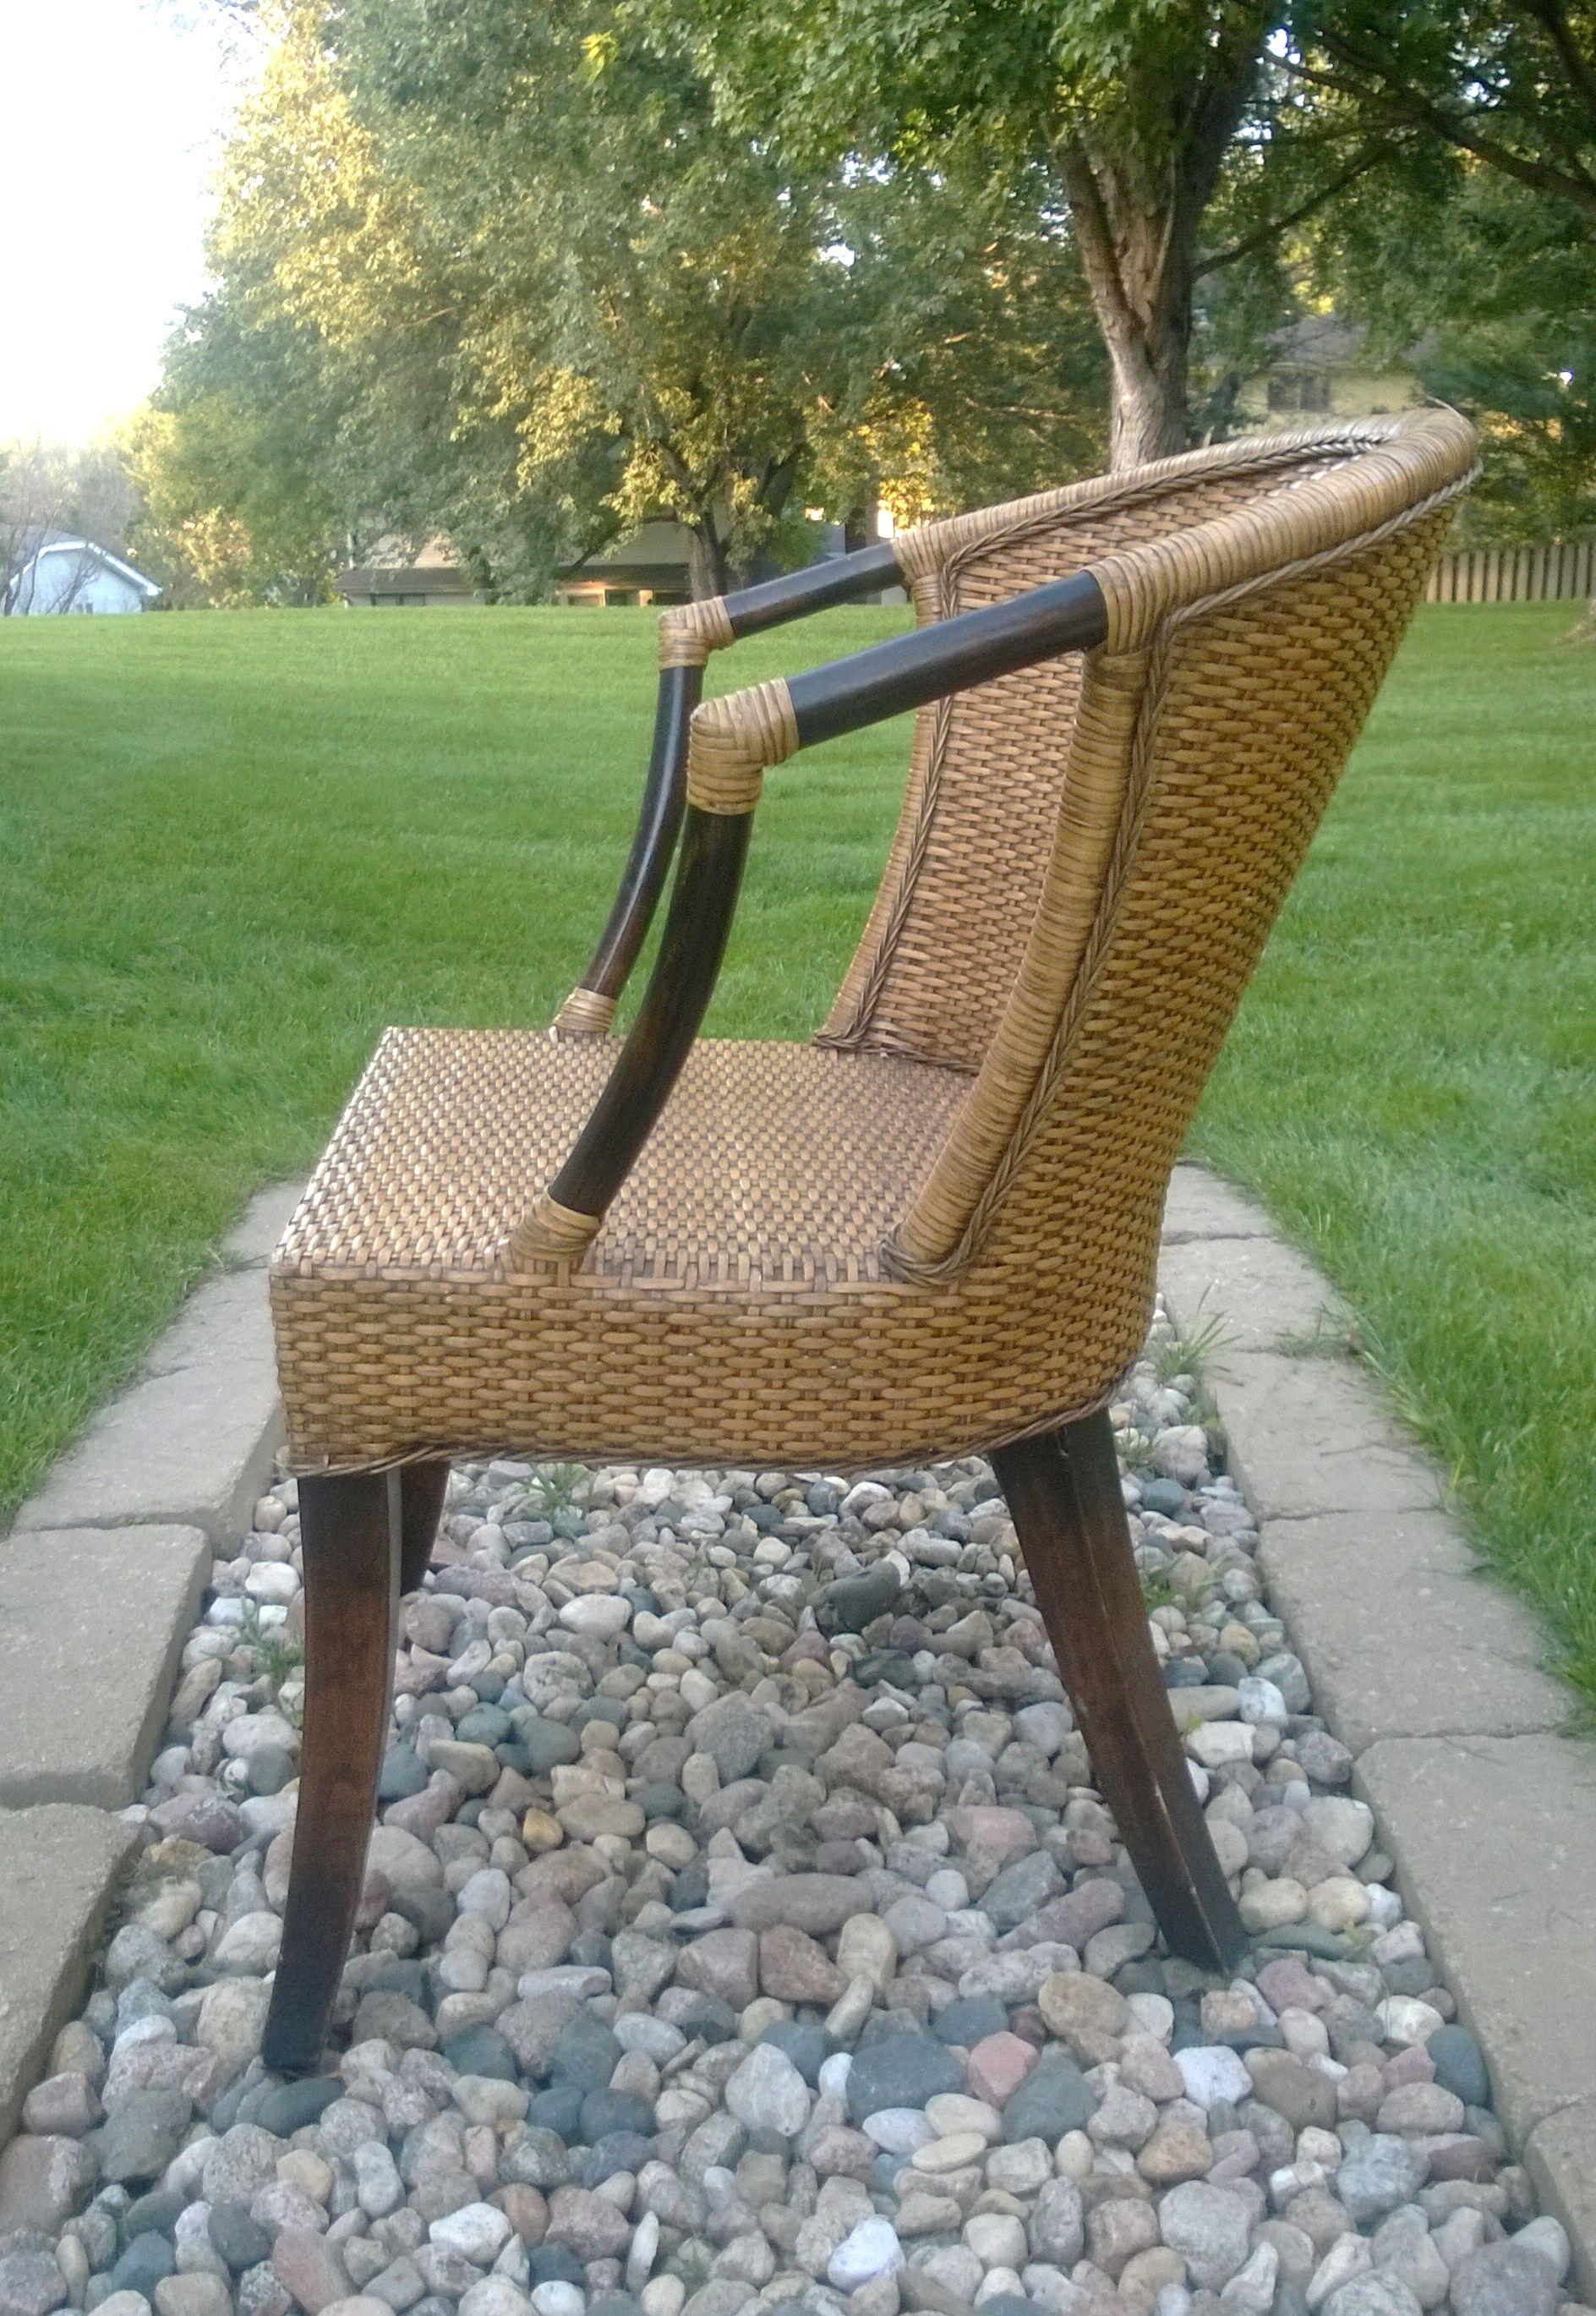 65 woven lacquerglazed rattan and hardwood barrelback